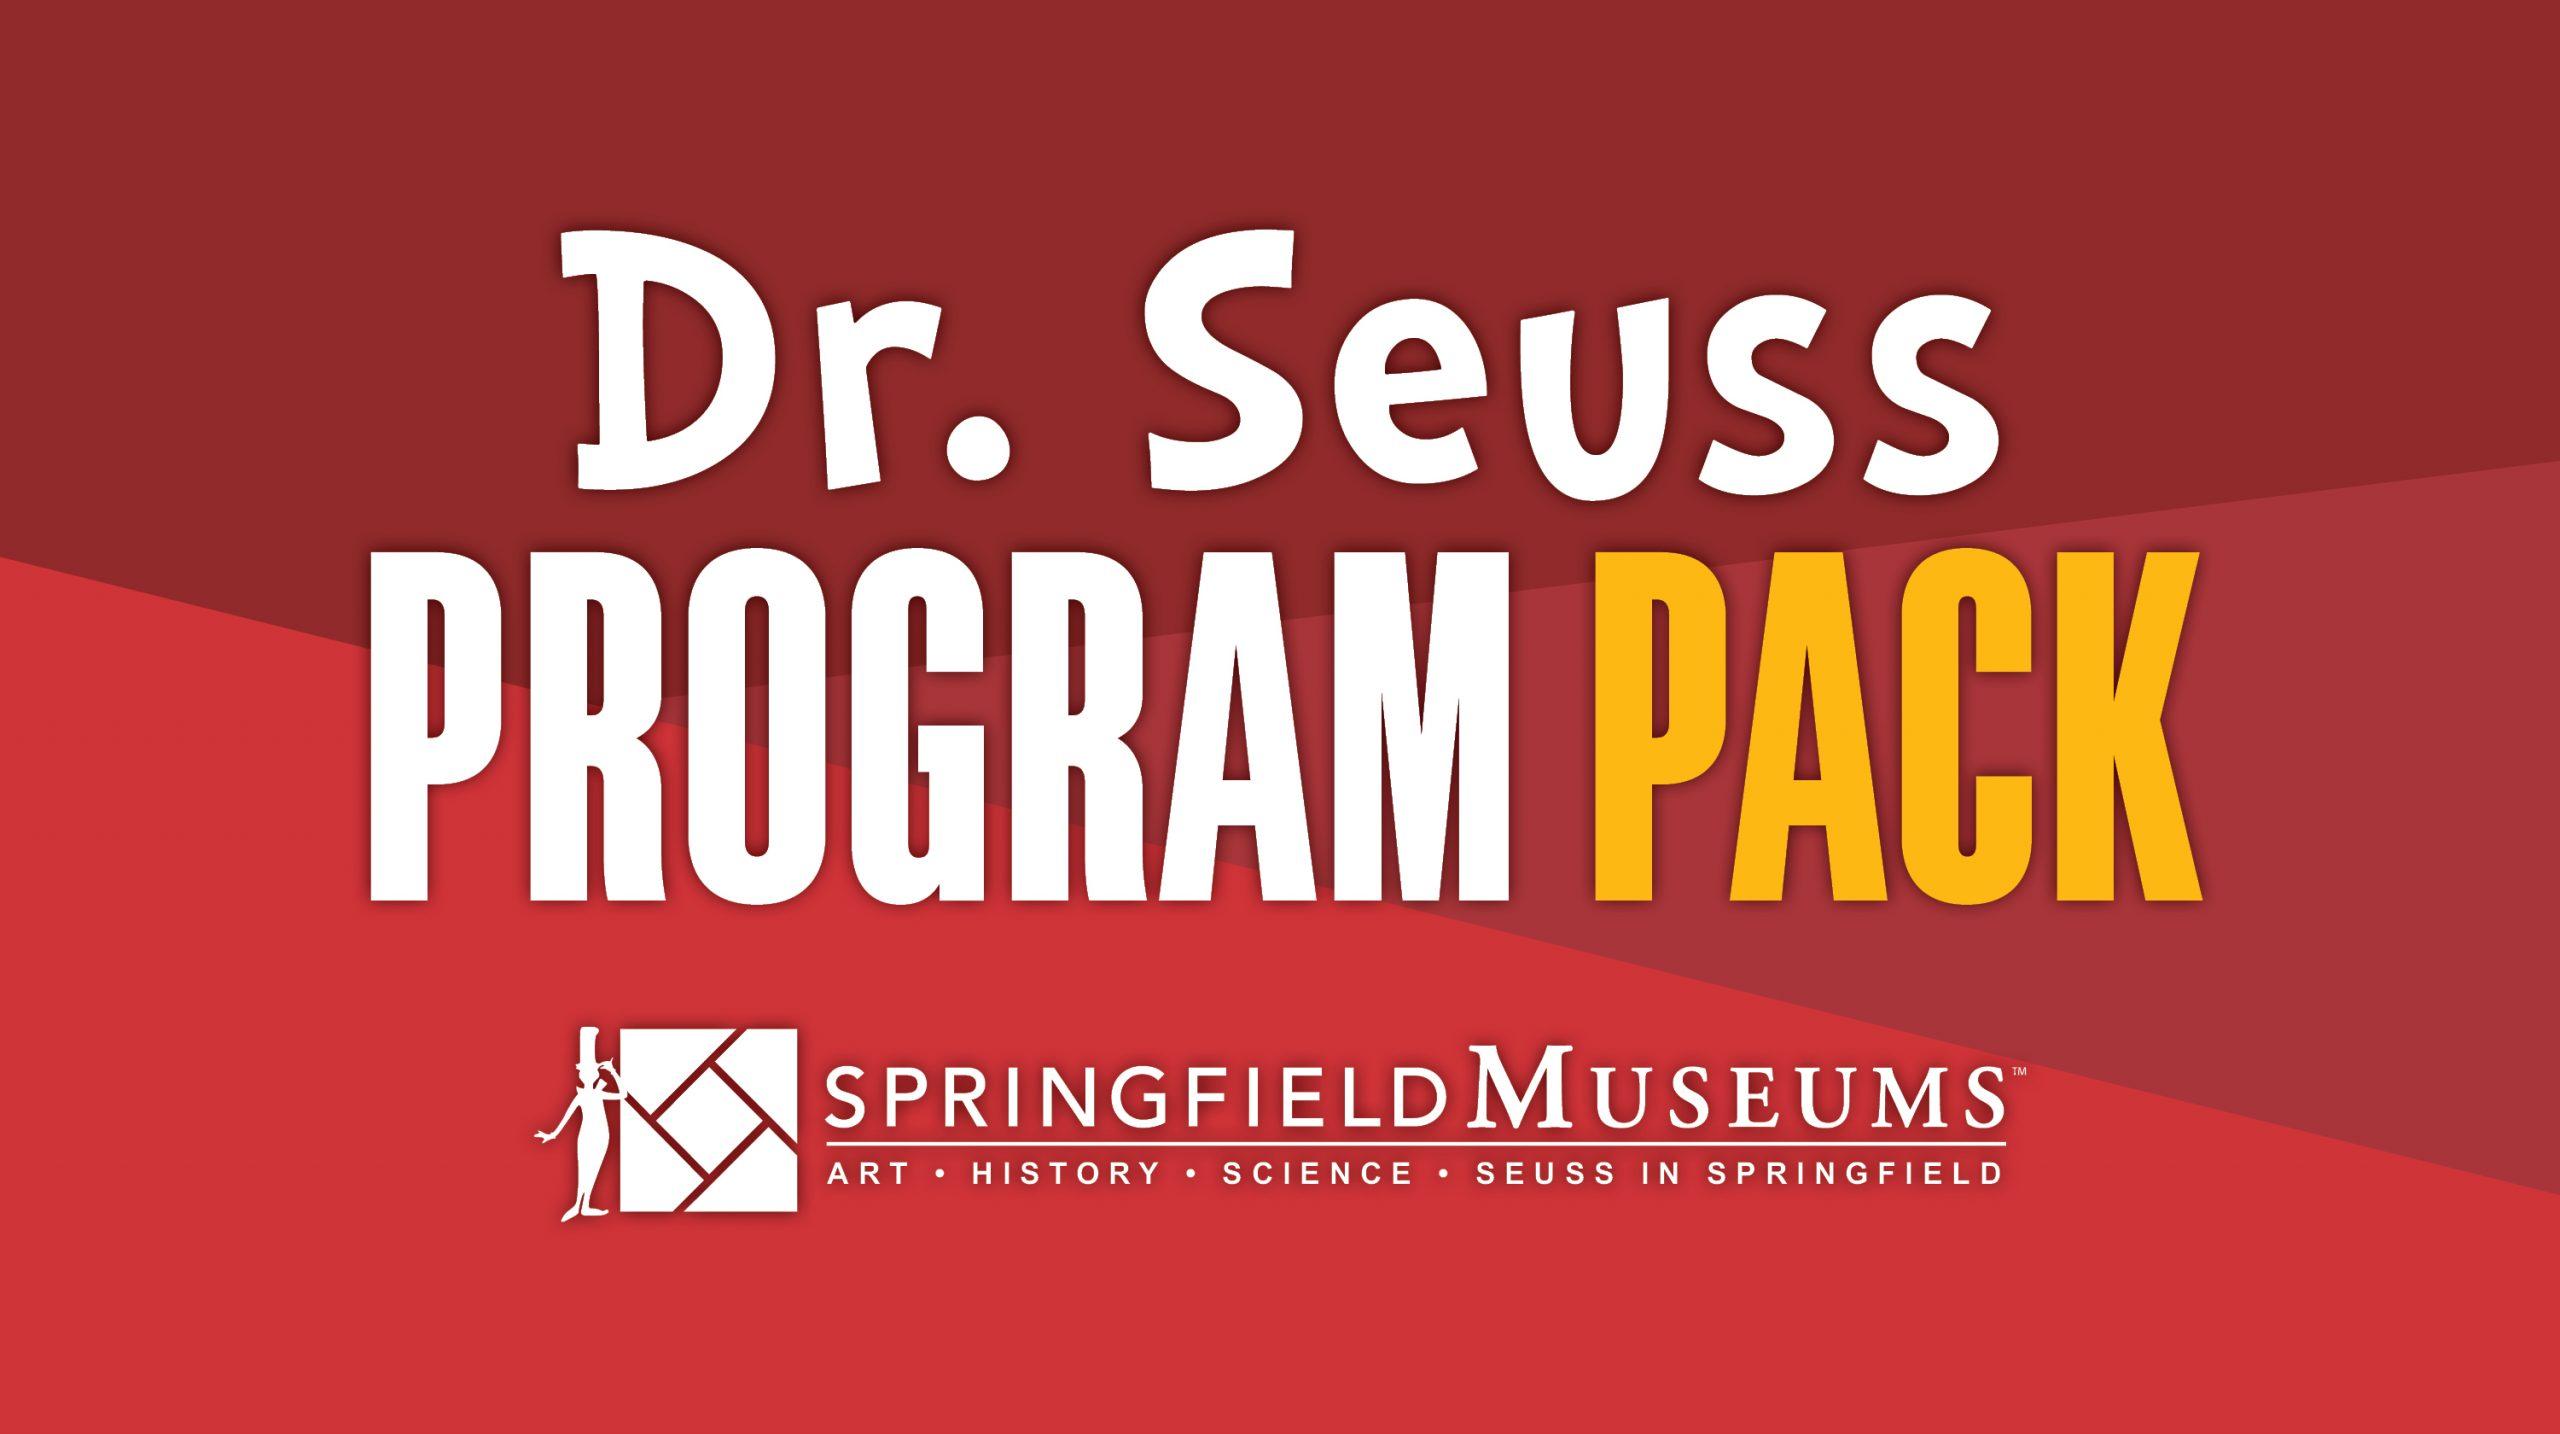 Dr. Seuss Program Pack